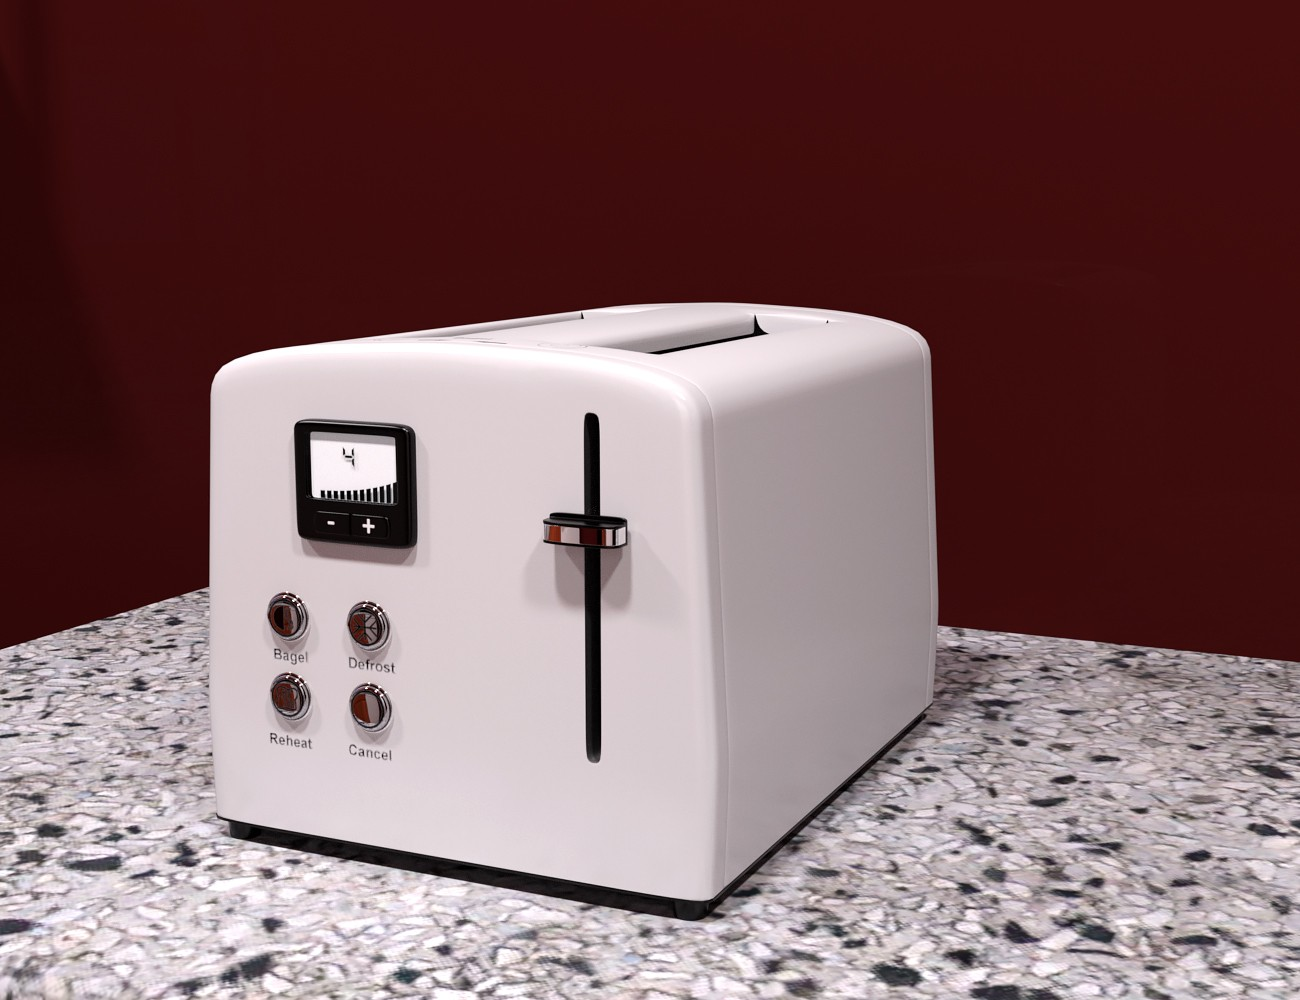 Mini Kitchen Appliances Tile Floors Download Daz Studio 3 For Free 3d Small